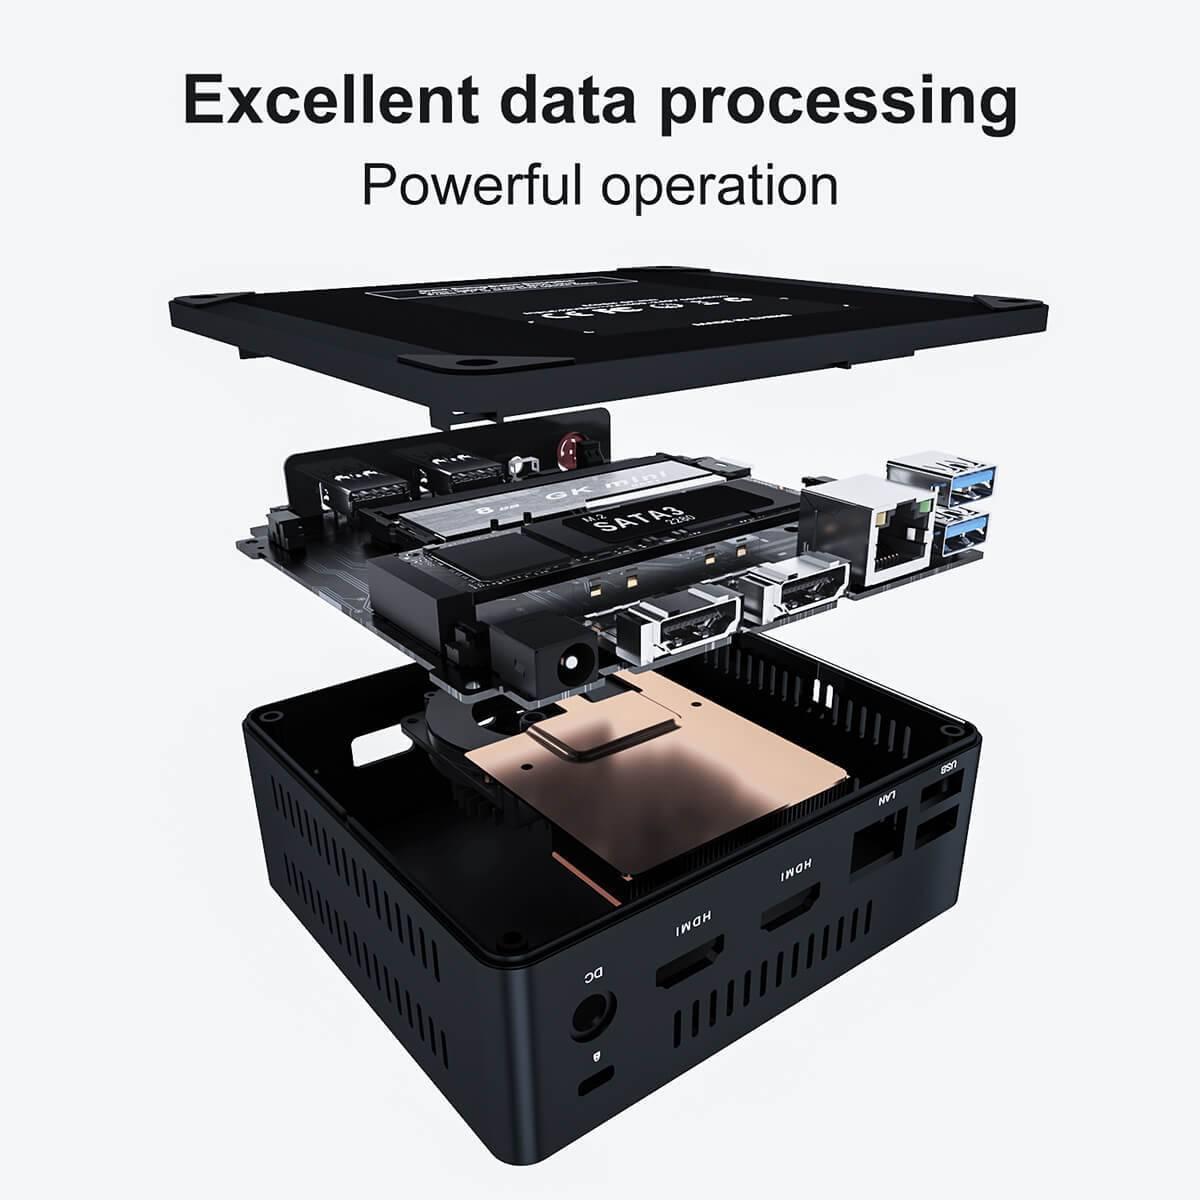 Beelink GK Mini Intel NUC Windows PC showing internal hardware